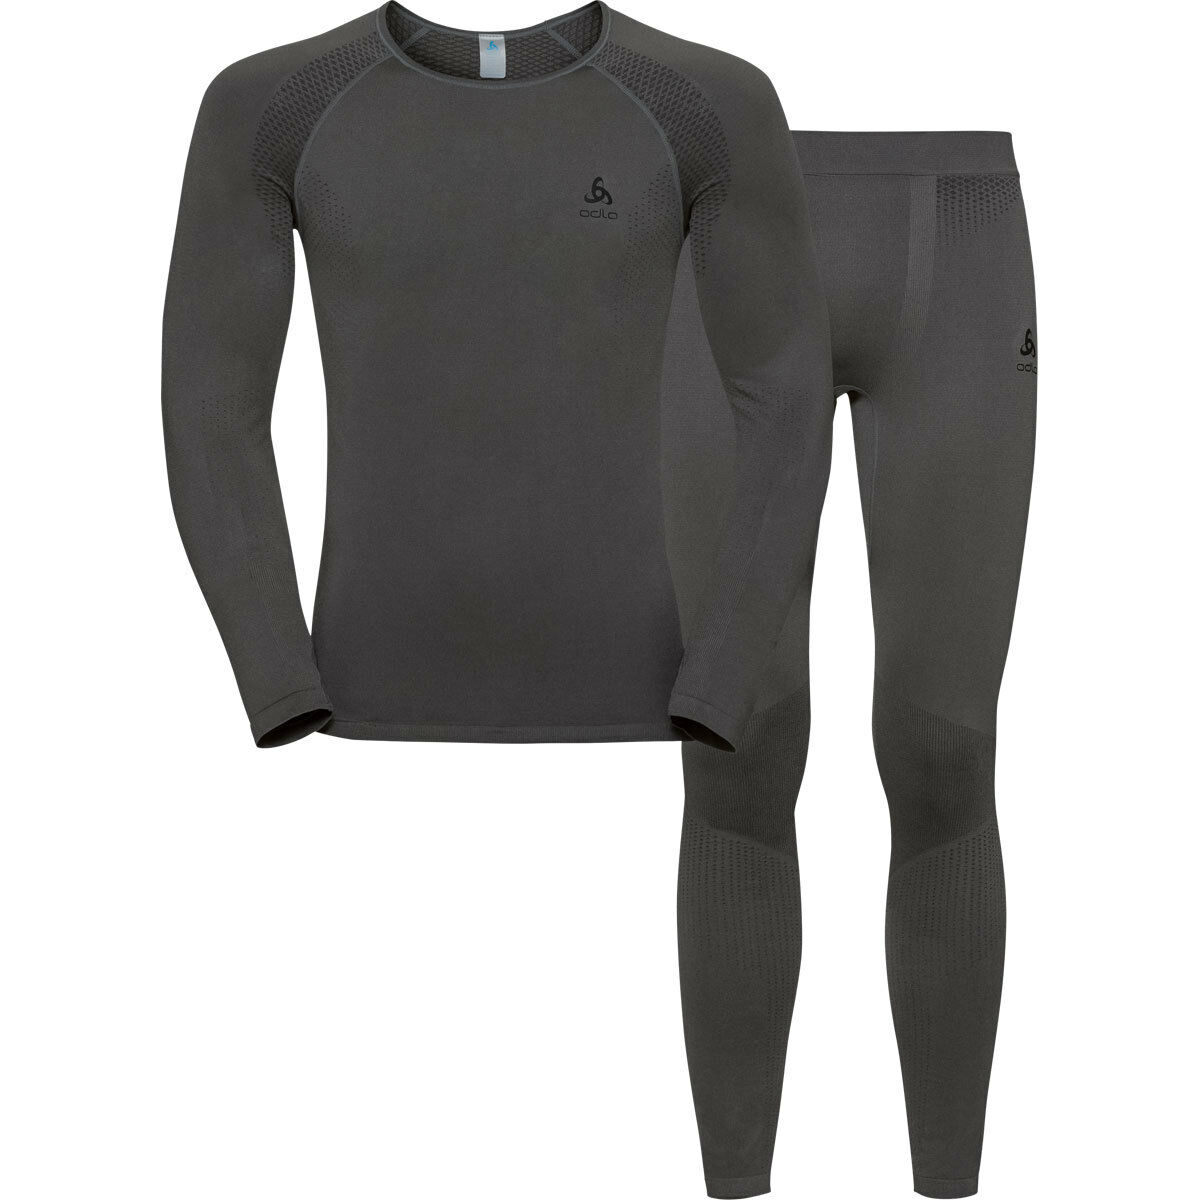 ODLO sotto lavaggi Set Maglietta E Pantaloni Pantaloni Pantaloni Per Uomo GrigioNero   19428210493 4a7